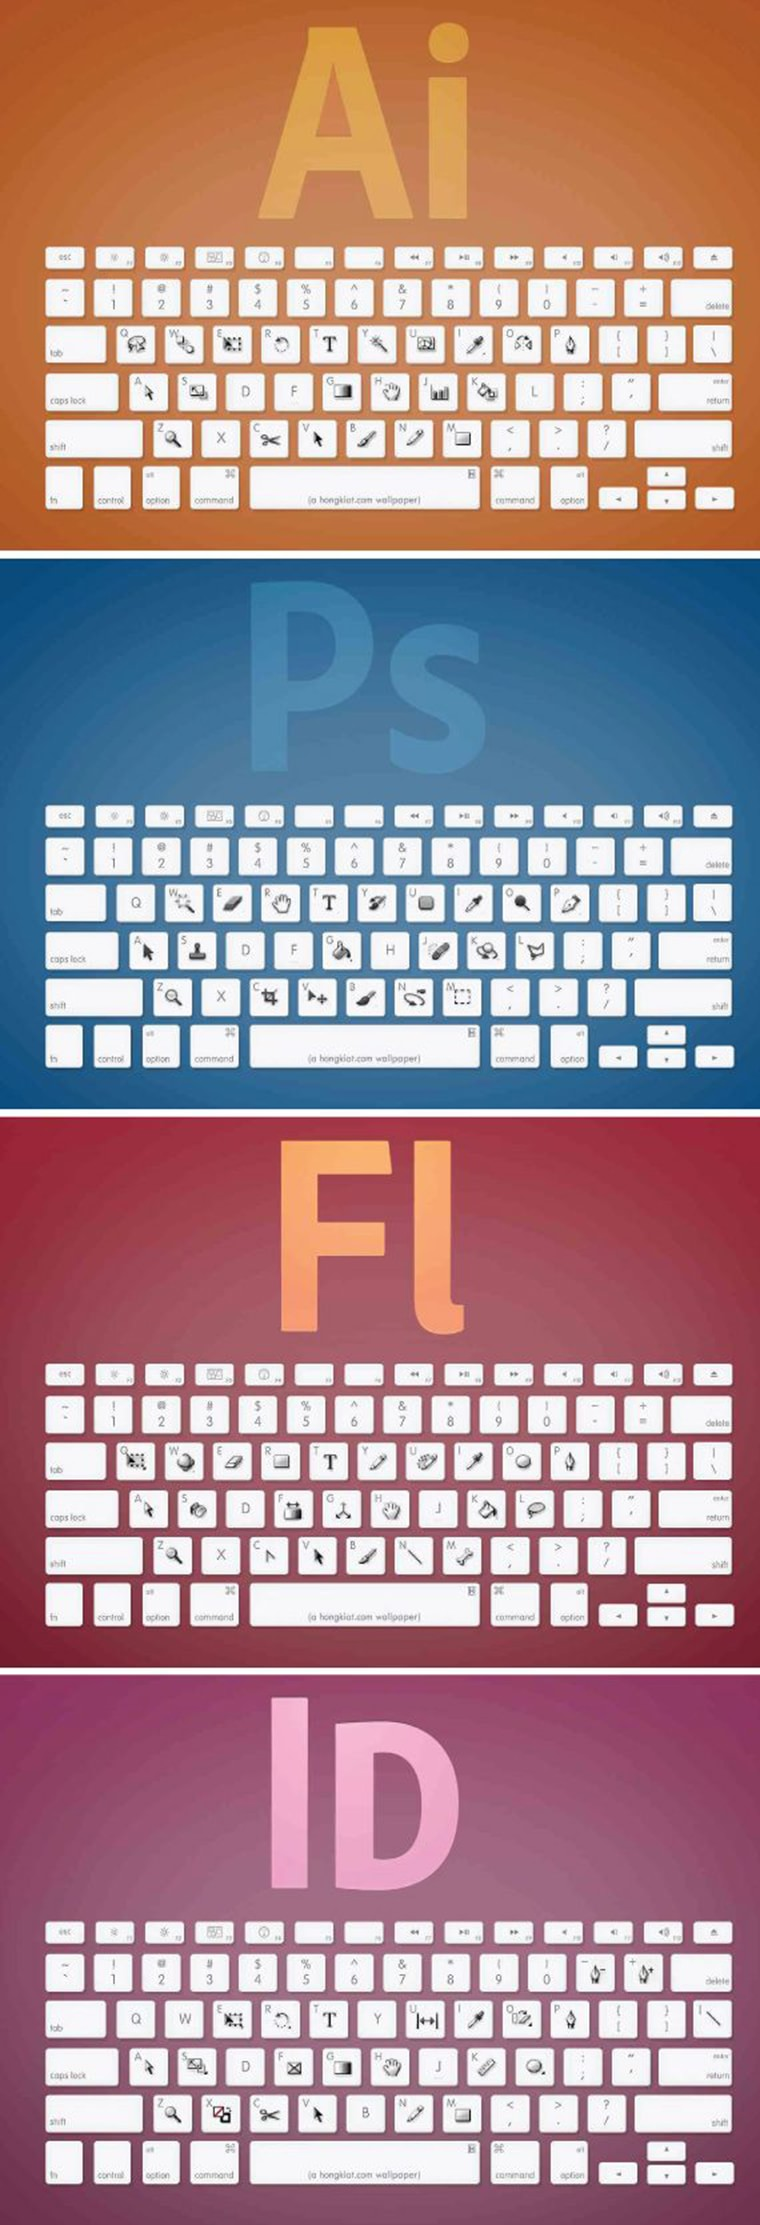 raccourci clavier photoshop illustrator indesign flash apple